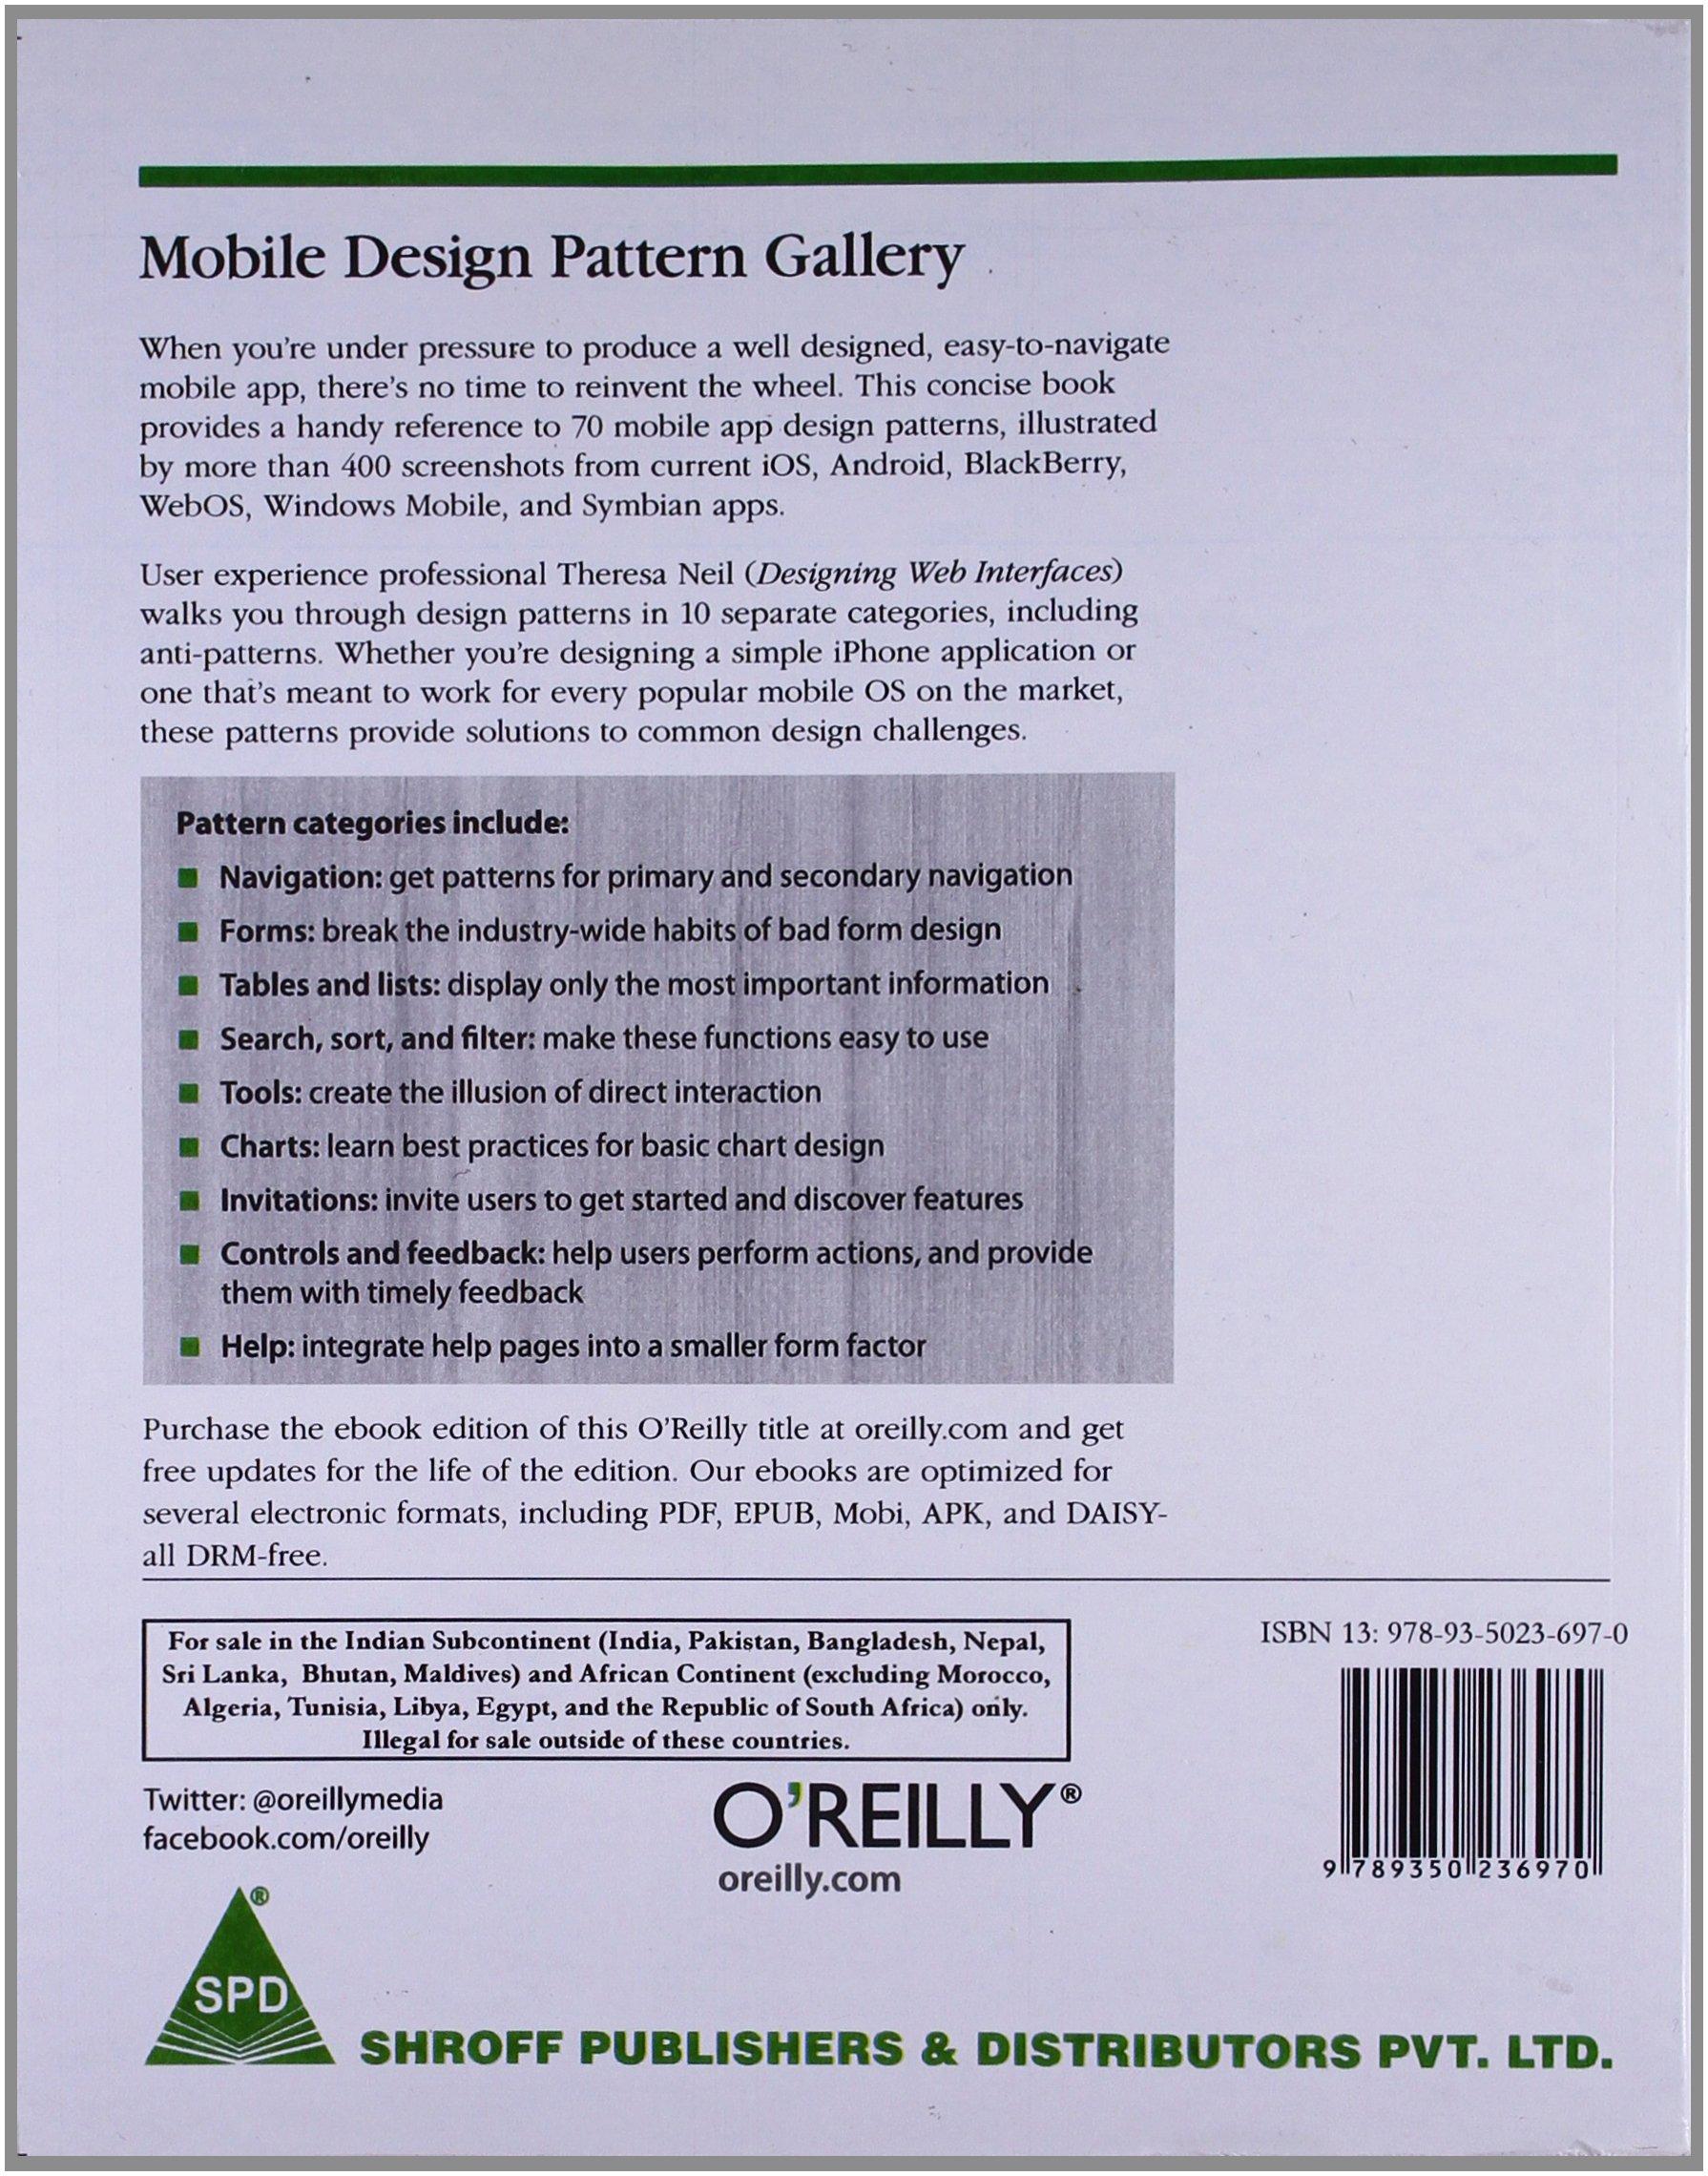 Mobile Design Pattern Gallery Ebook